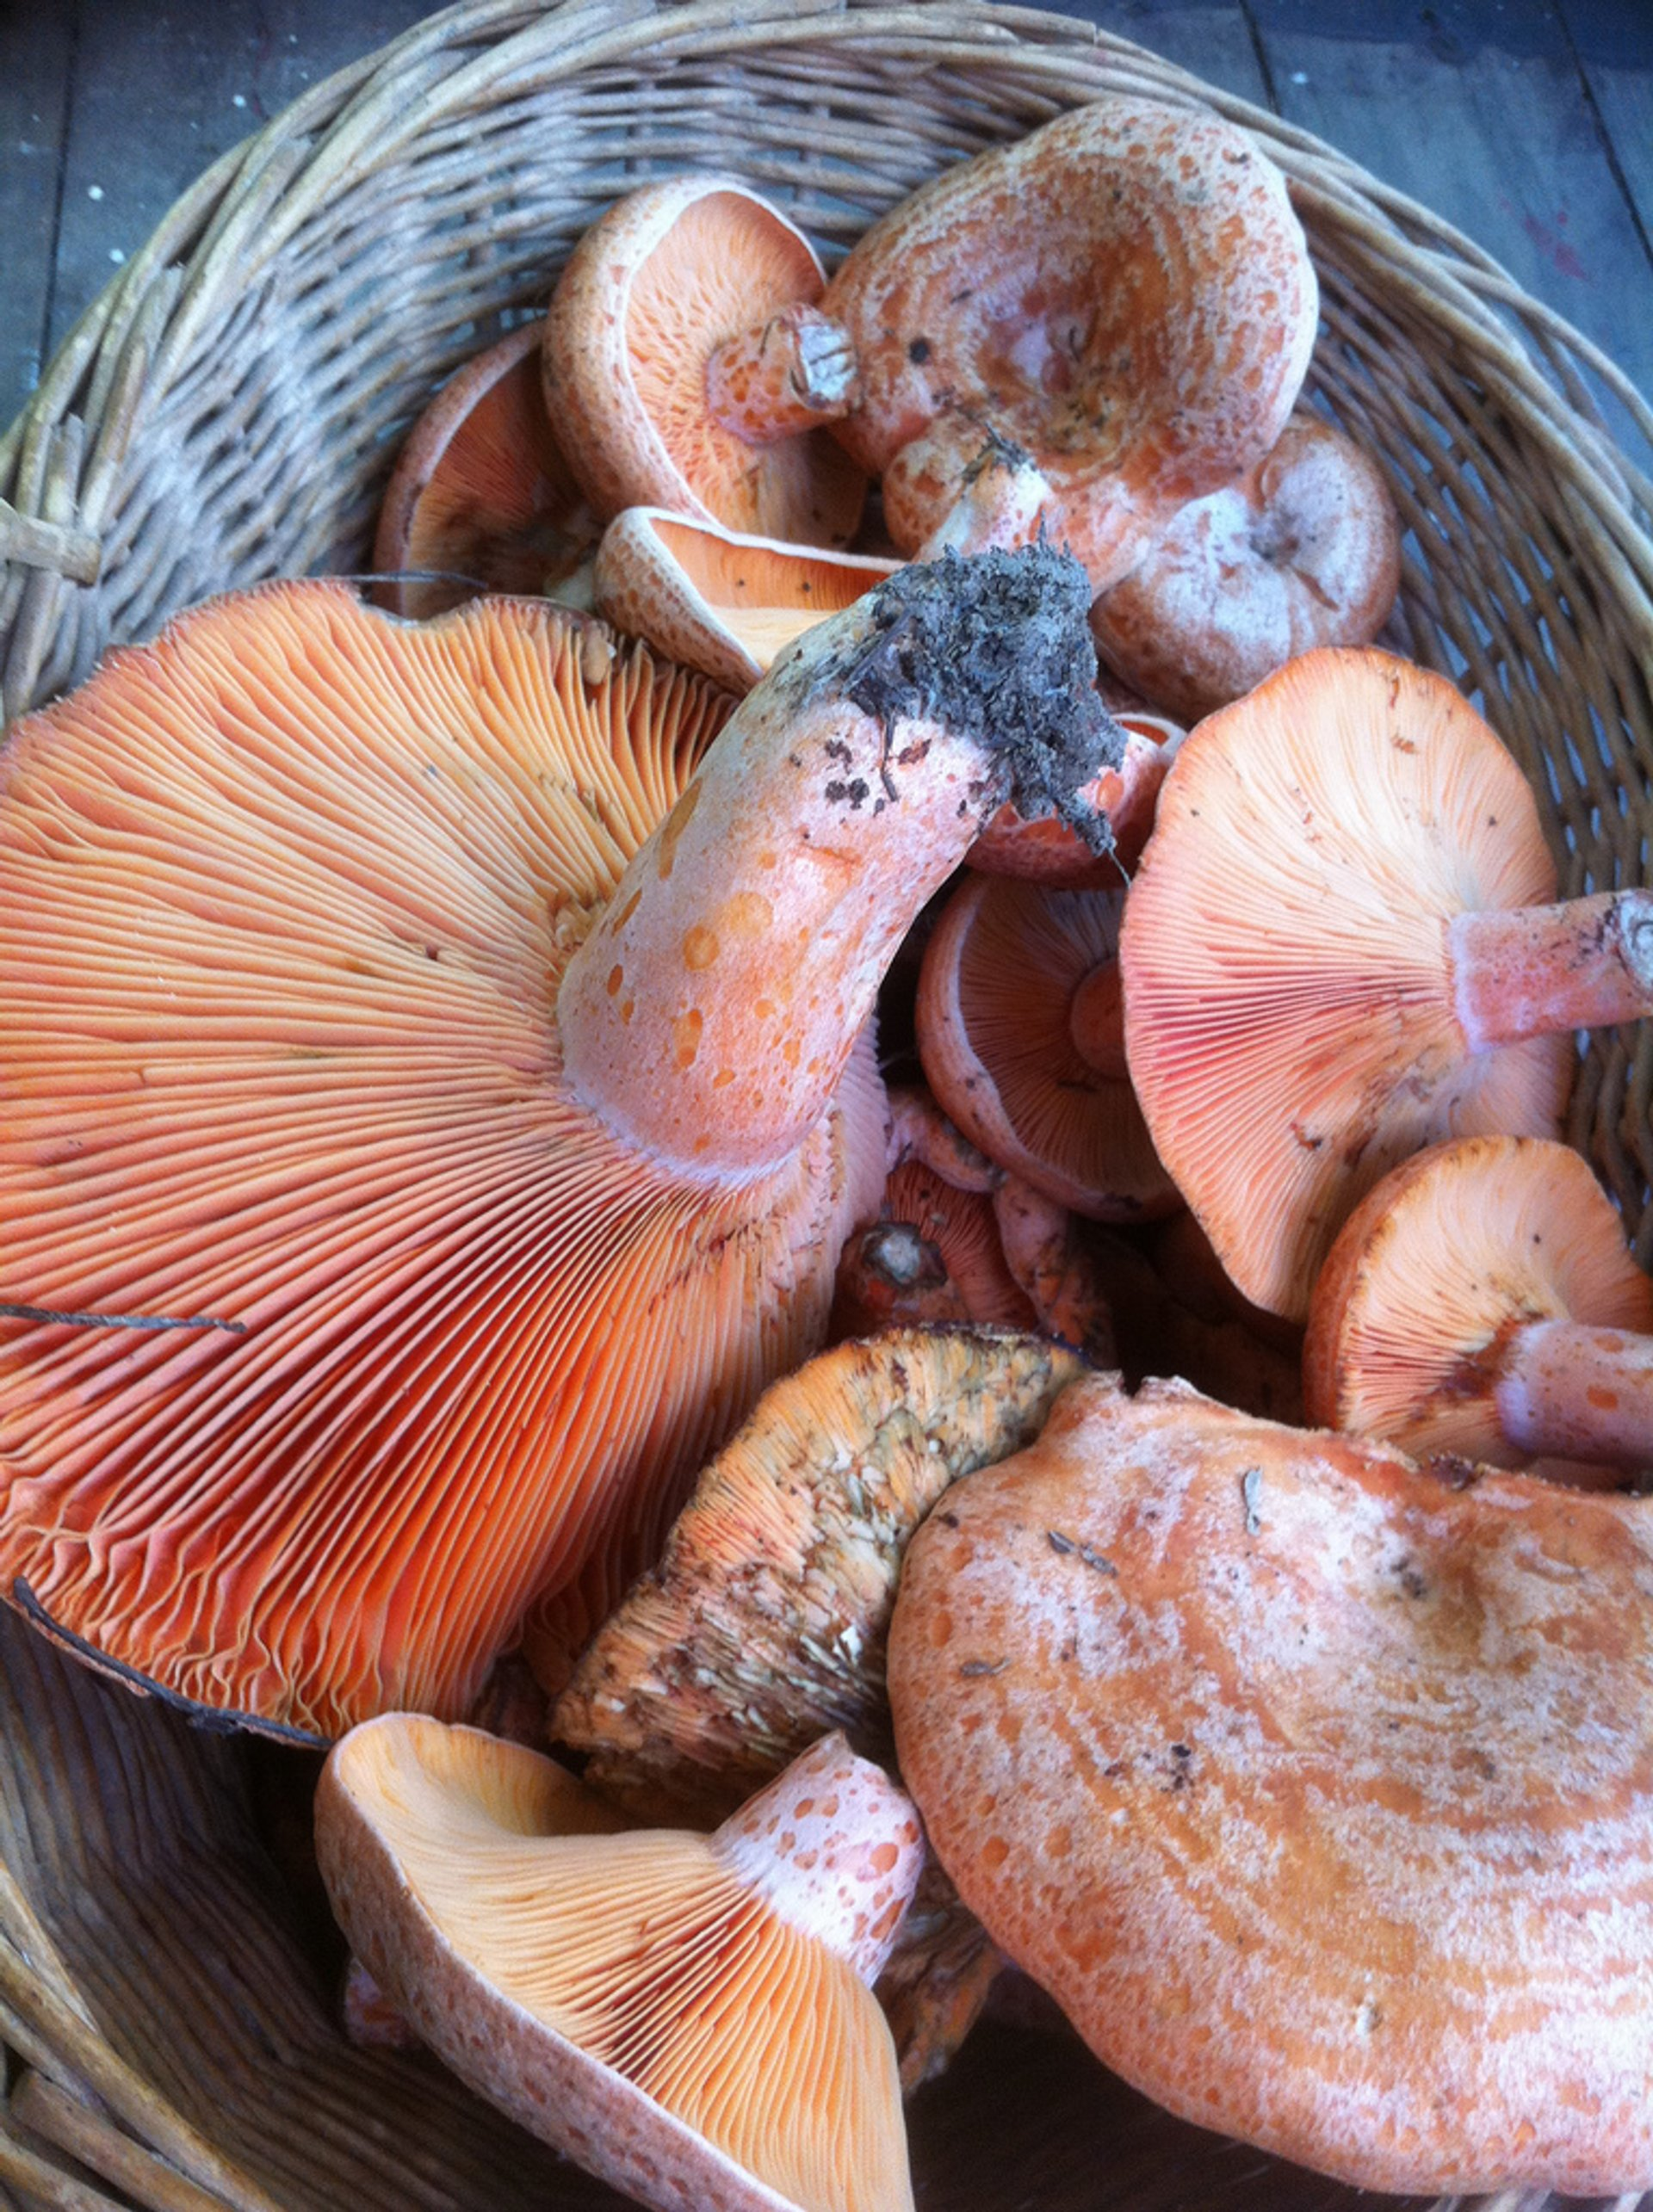 Pine Mushrooms (Saffron Milk Caps) in Australia - Best Season 2019